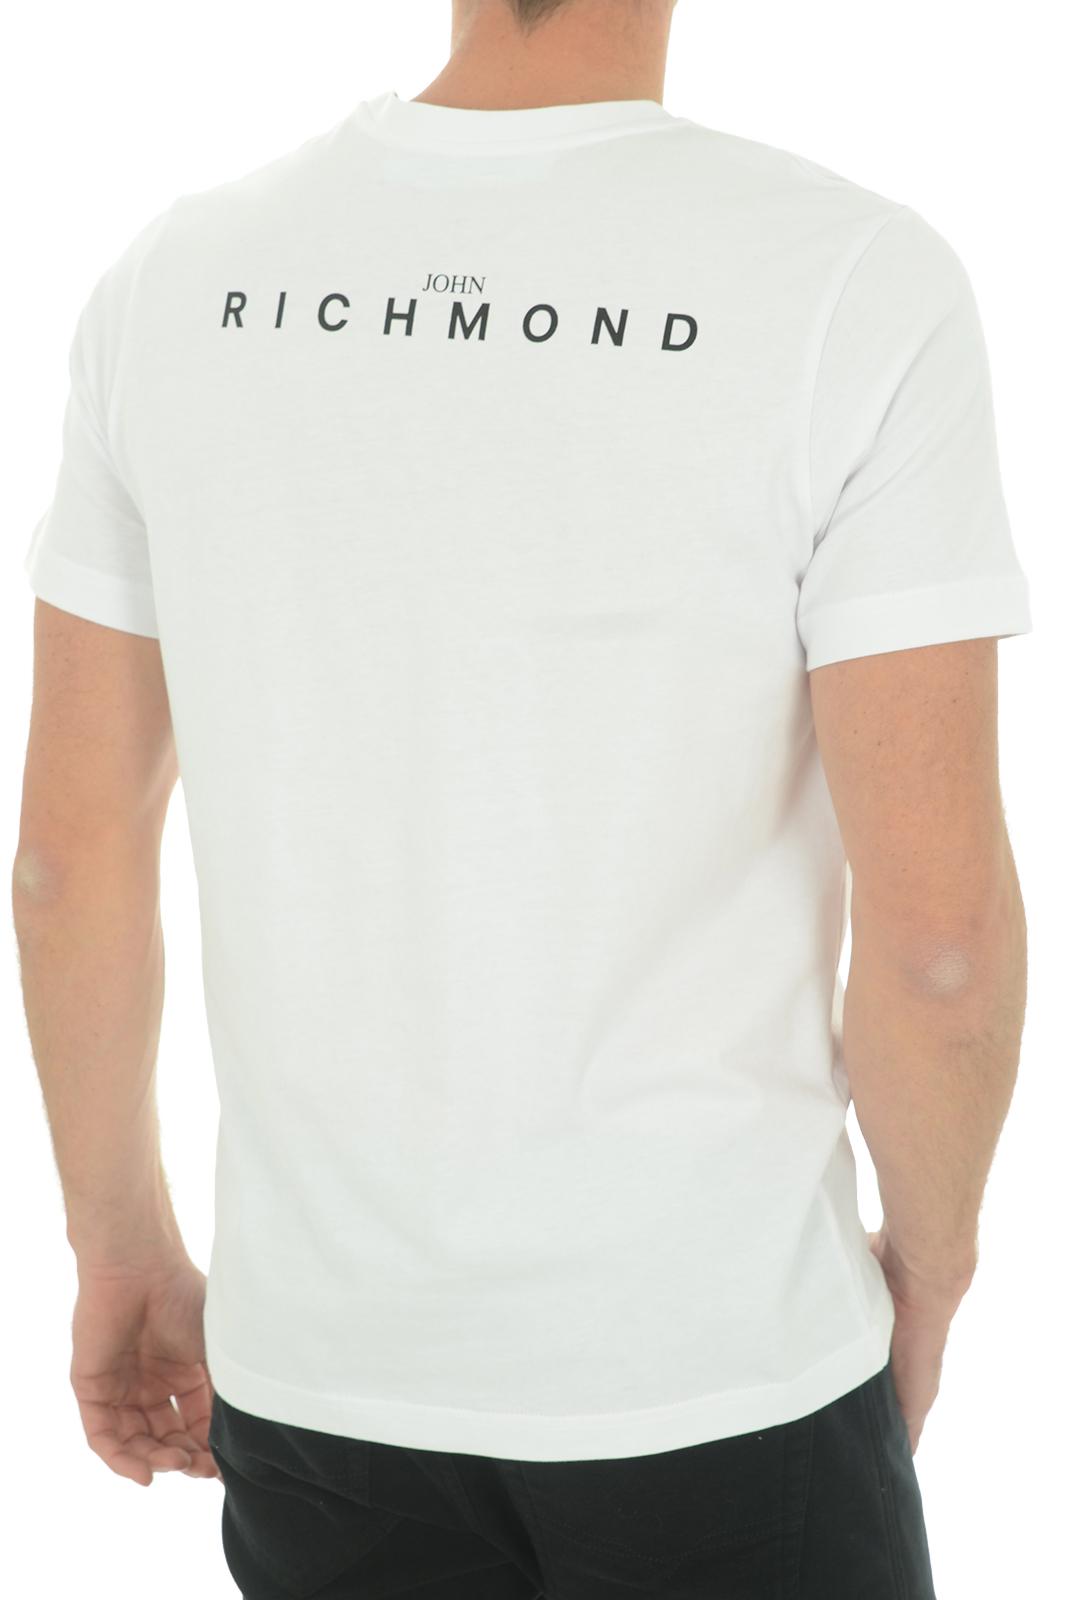 Tee-shirts  John richmond DAMOLANDIA W0019 BLANC